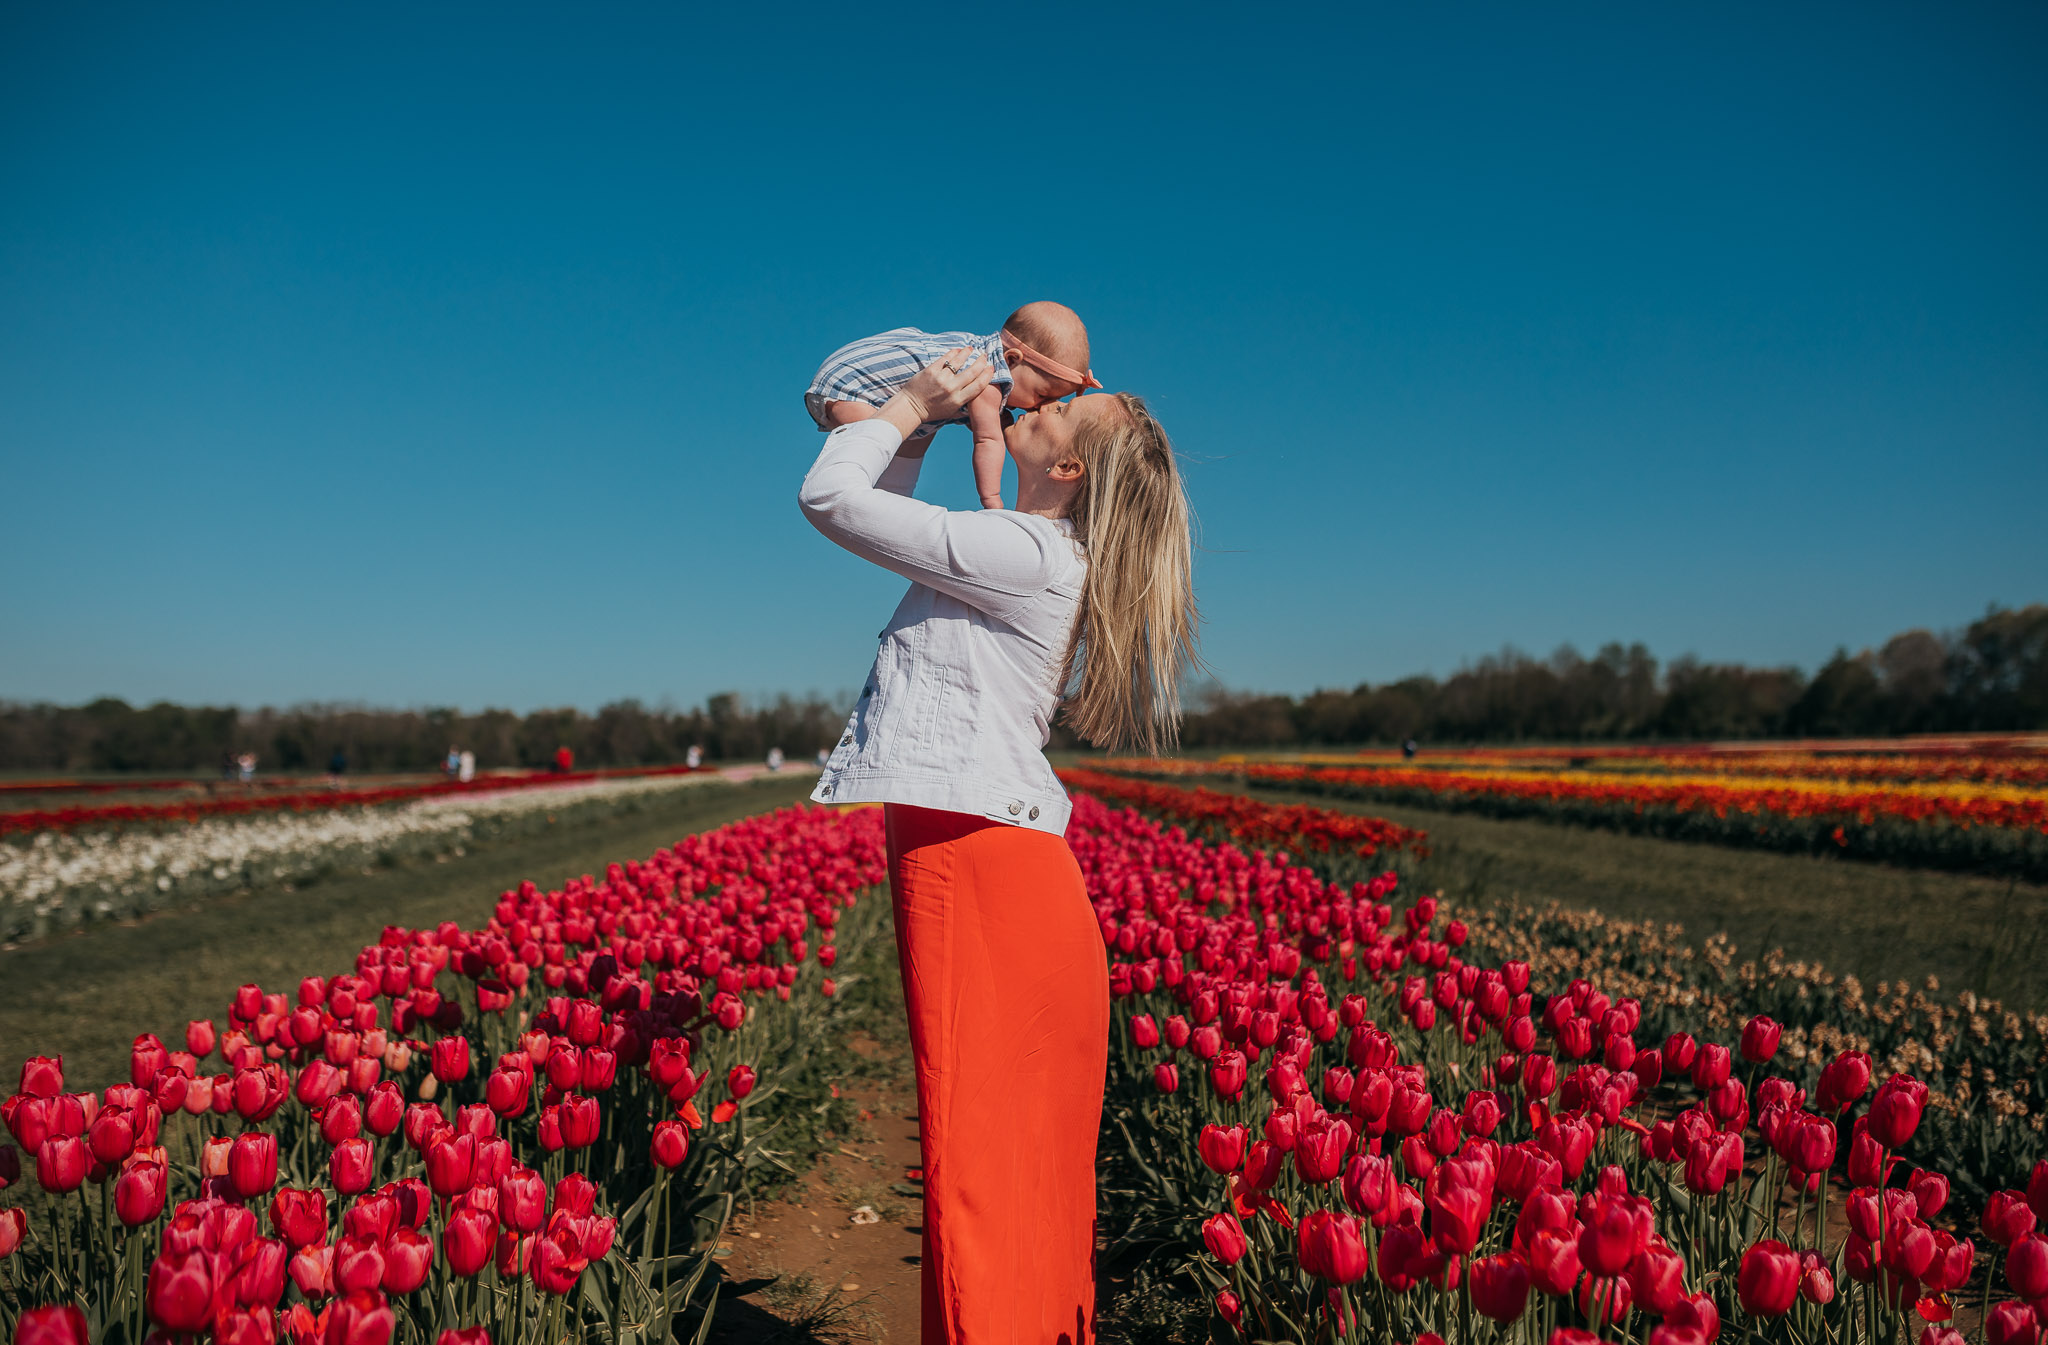 Tulips-4280.jpg